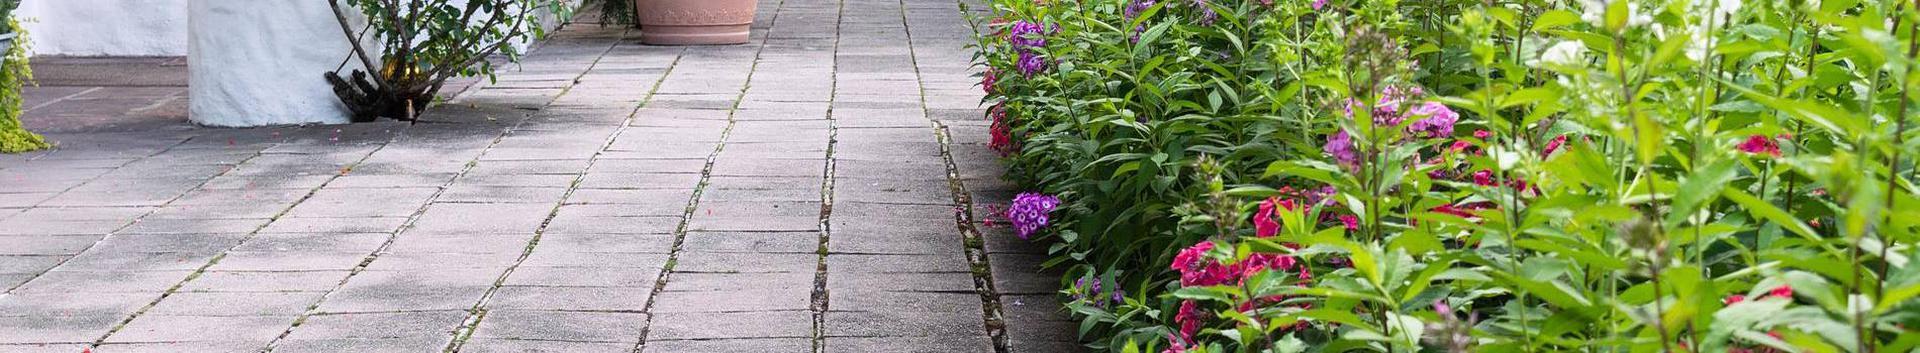 01291_muude-taimede-kasvatus_31278490_xl.jpg